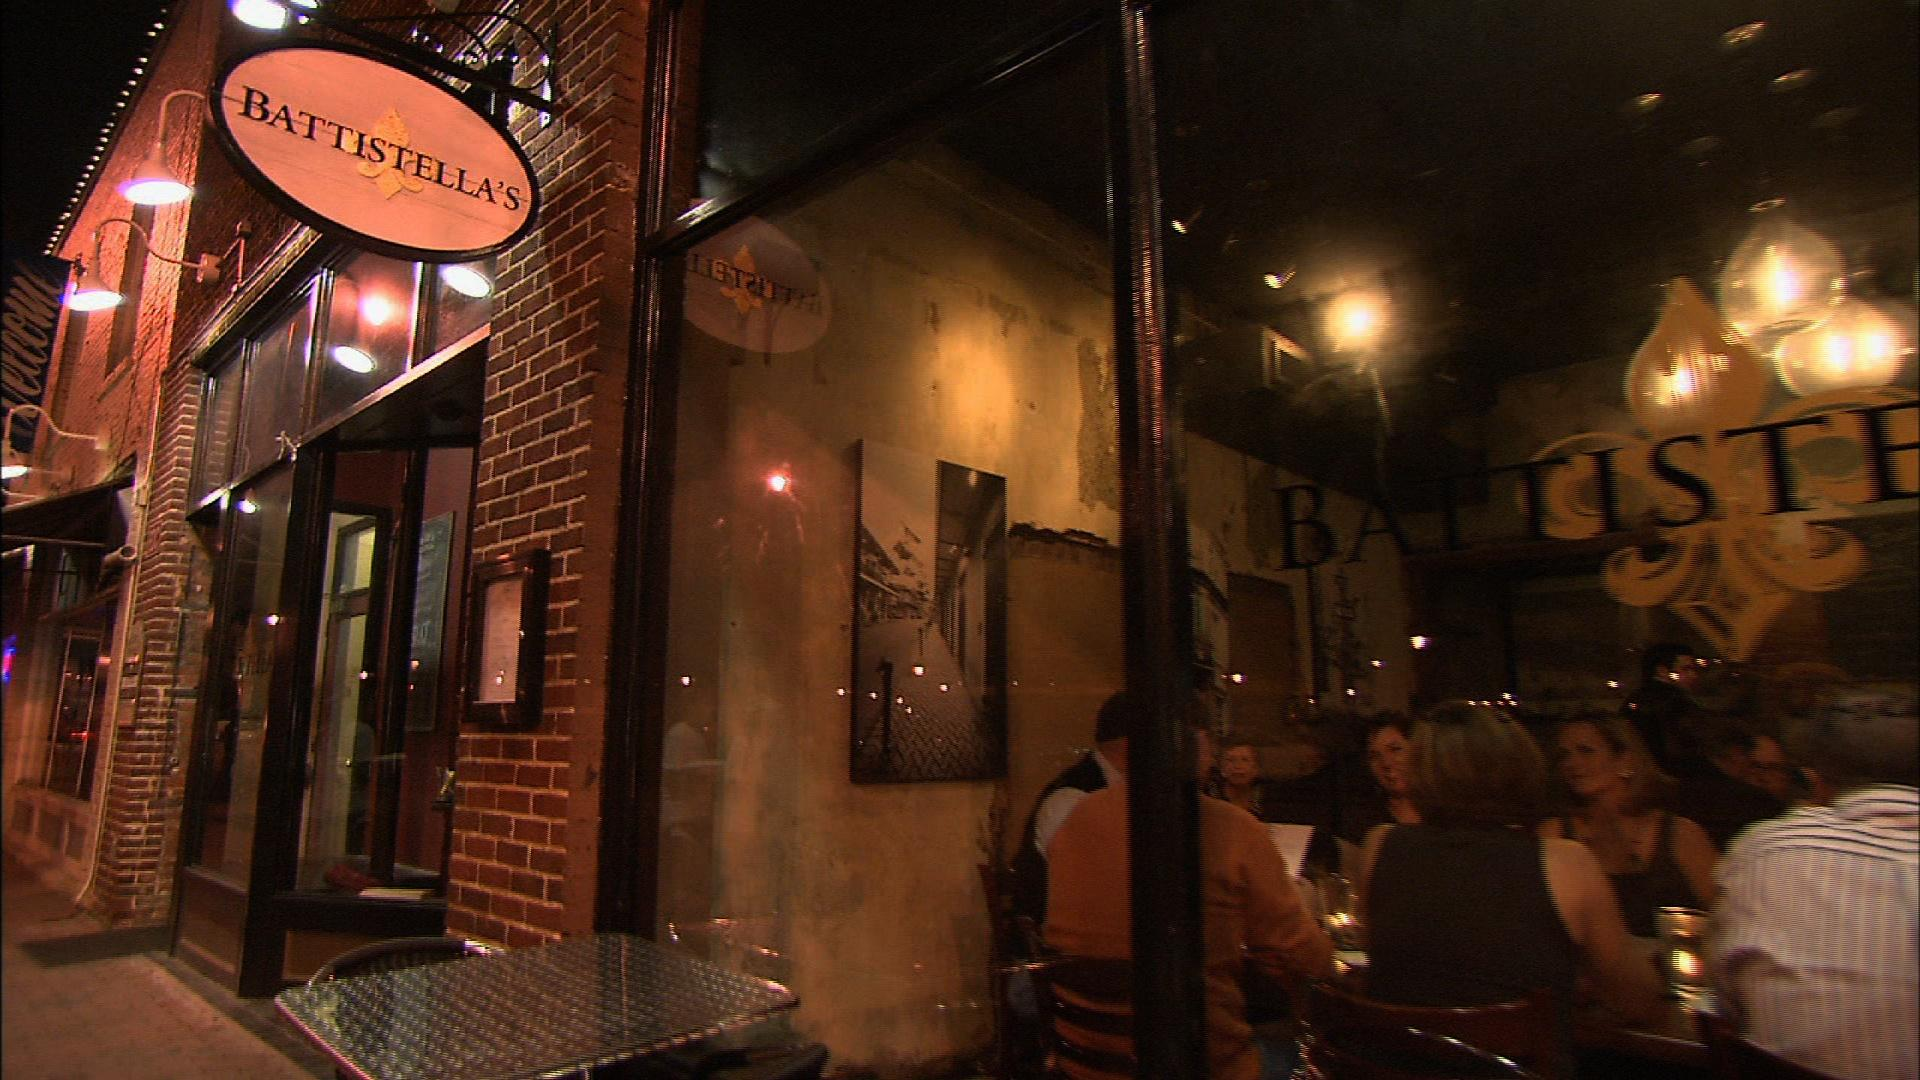 Battistella's New Orleans Cuisine image